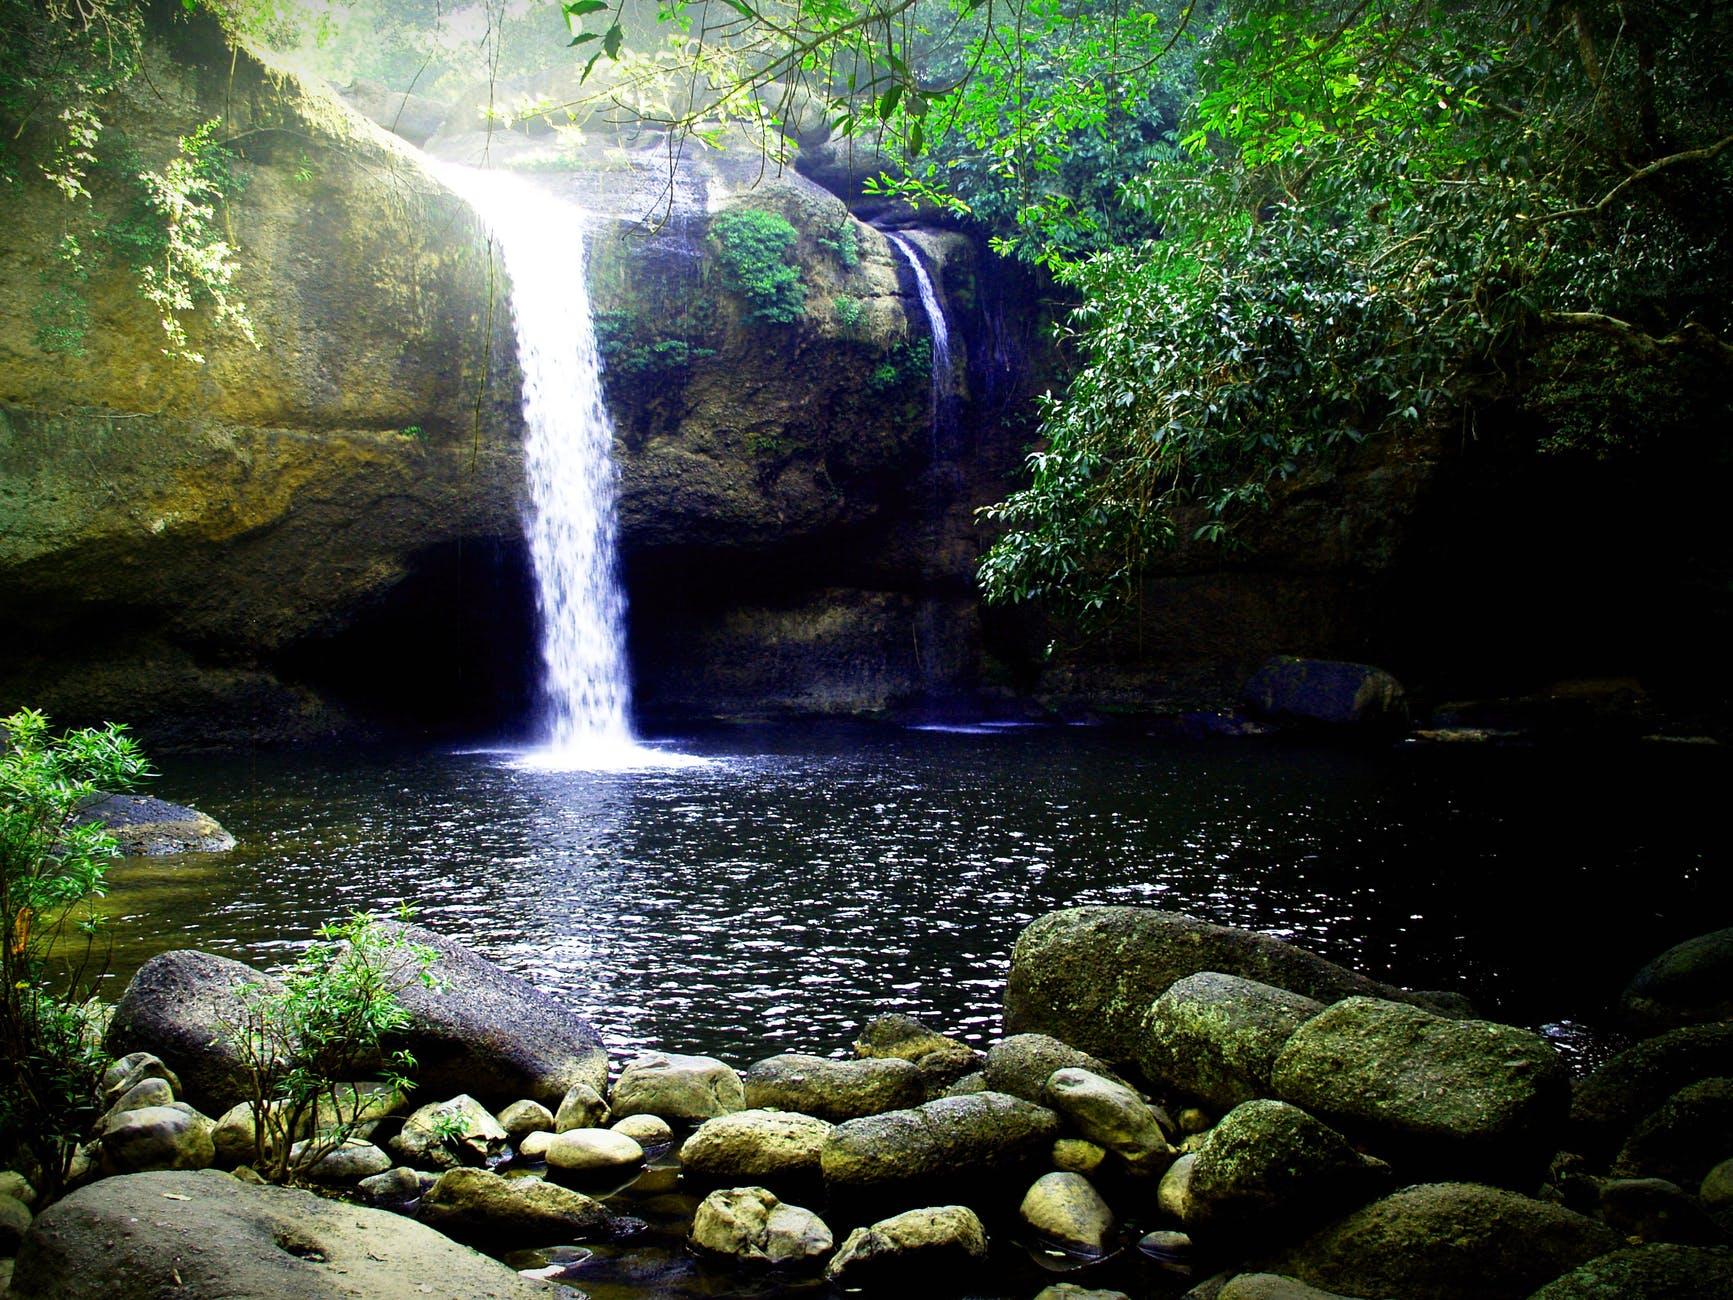 boulders cave creek environment